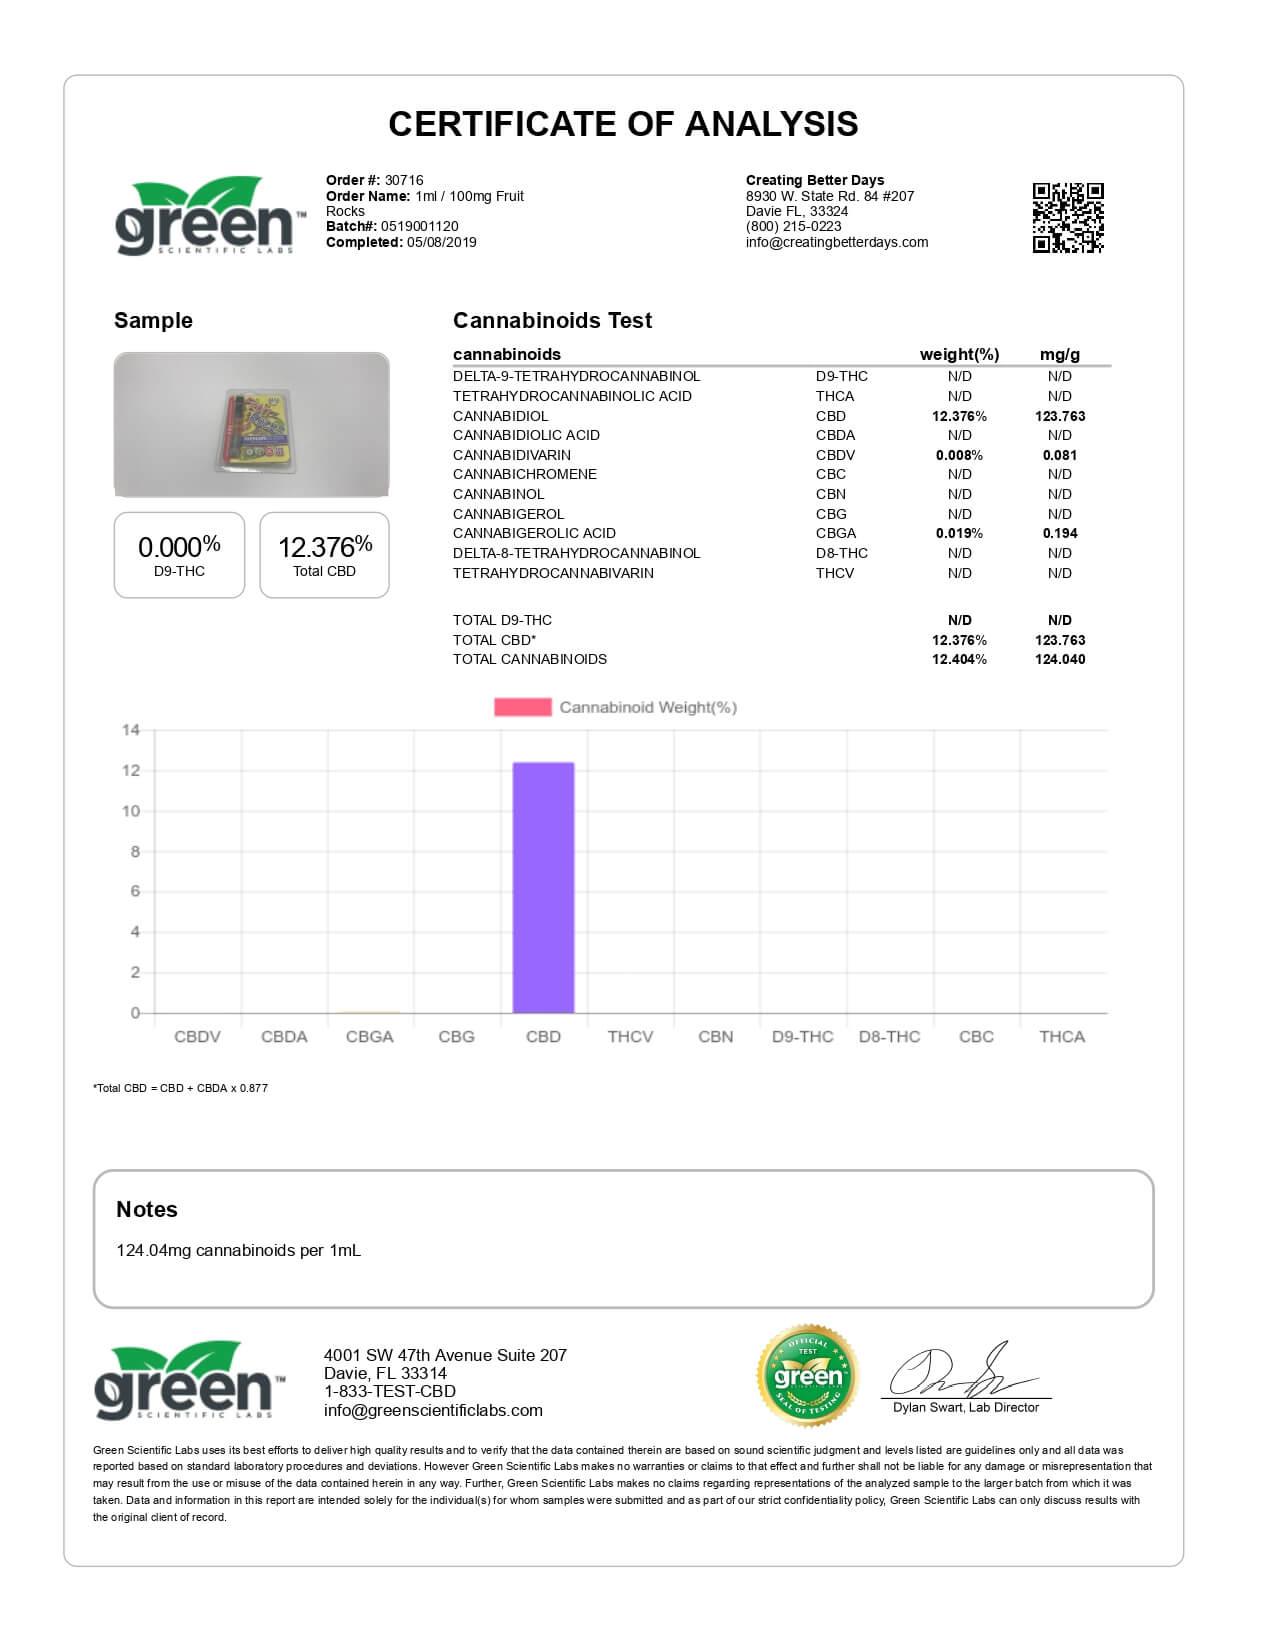 Creating Better Days CBD Cartridge Fruit Rocks 100mg Lab Report